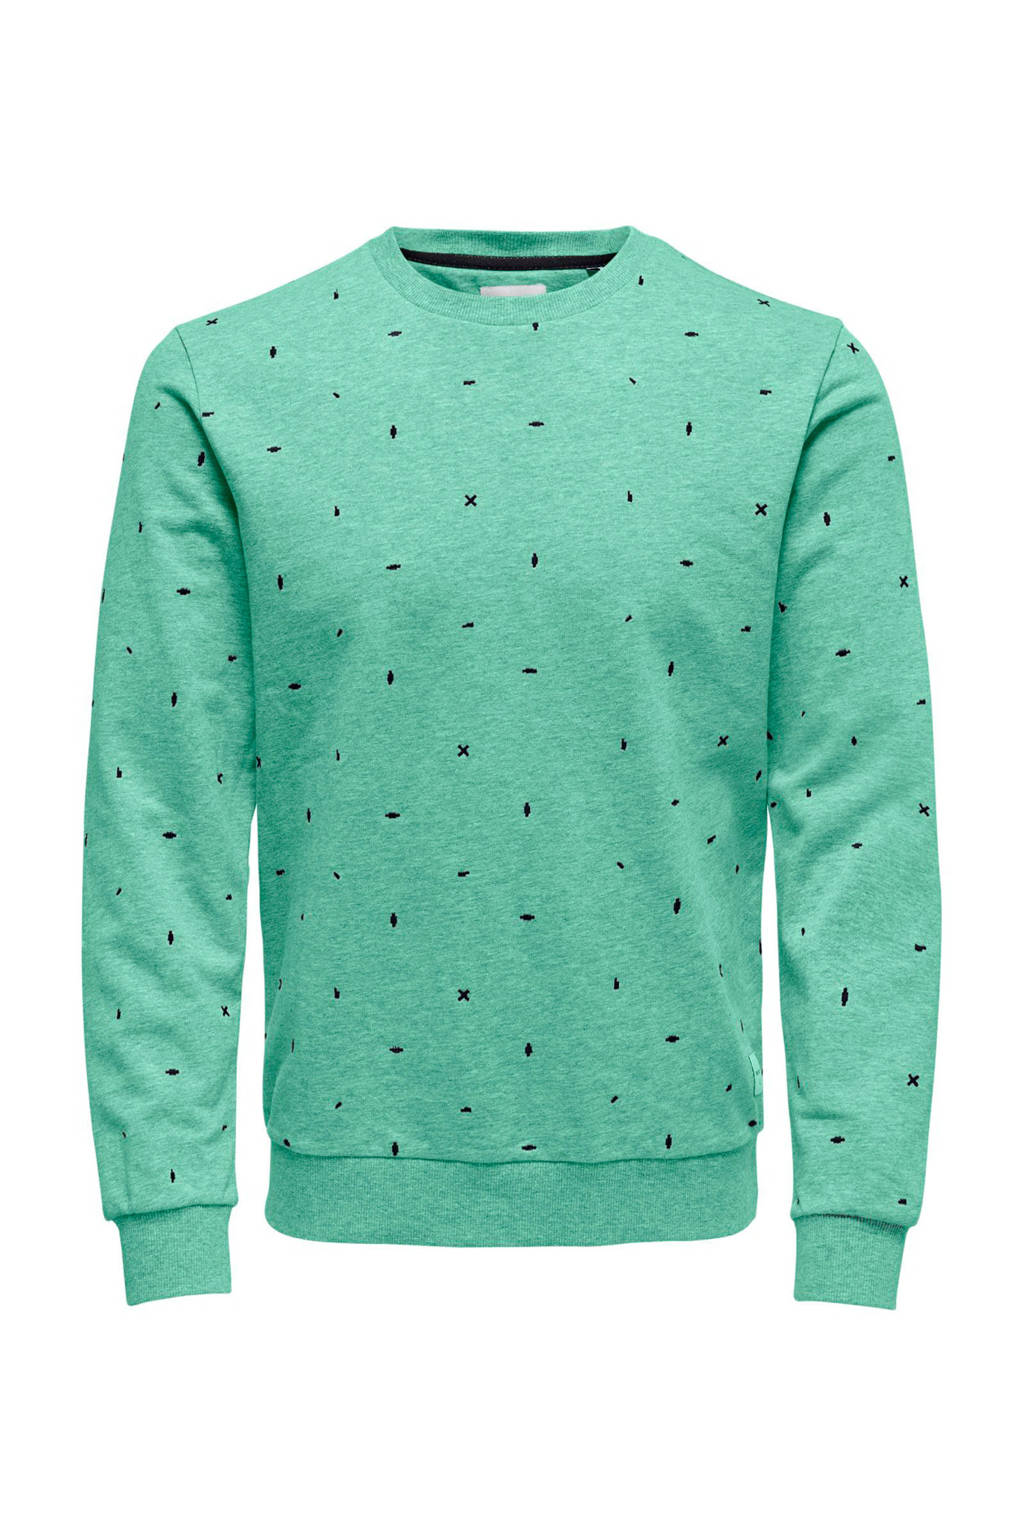 ONLY & SONS sweater, Lichtgroen